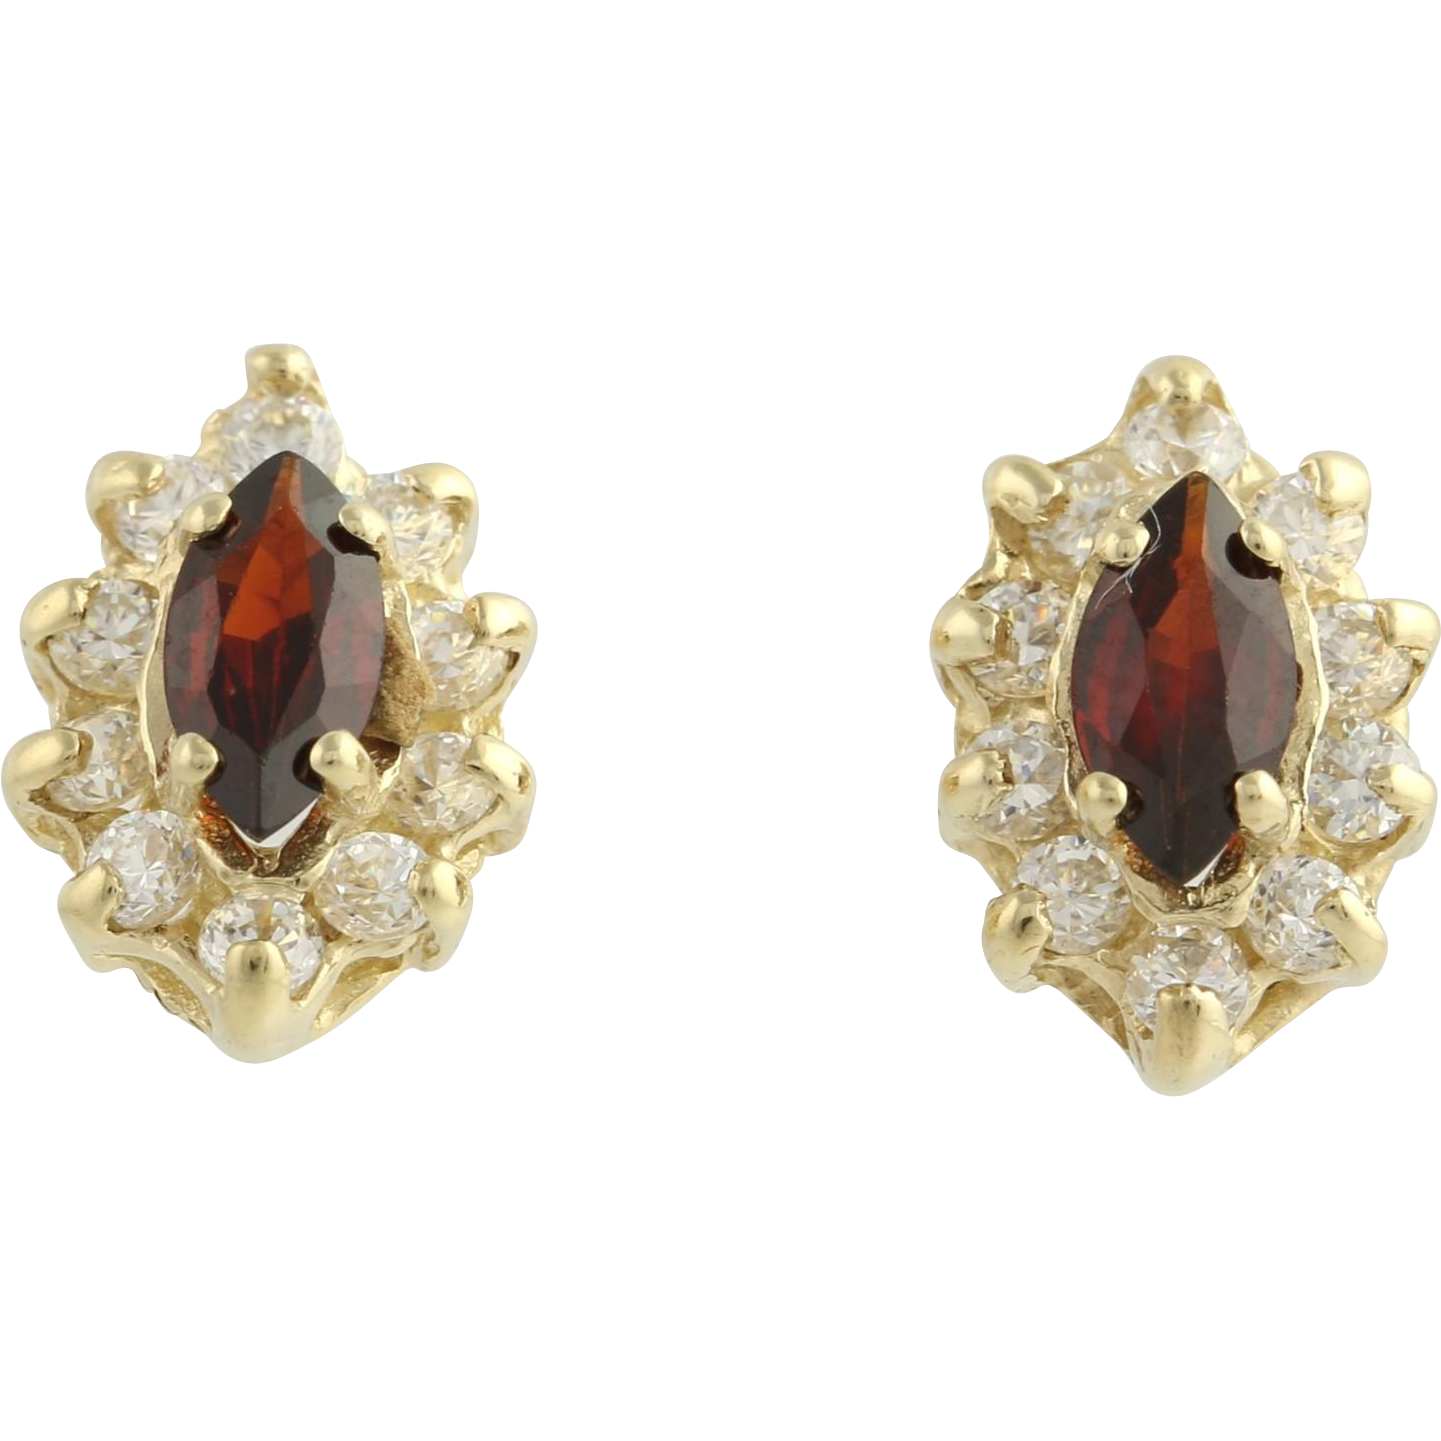 Garnet & Cubic Zirconia Earrings - 14k Yellow Gold January Fashion CZ Pierced